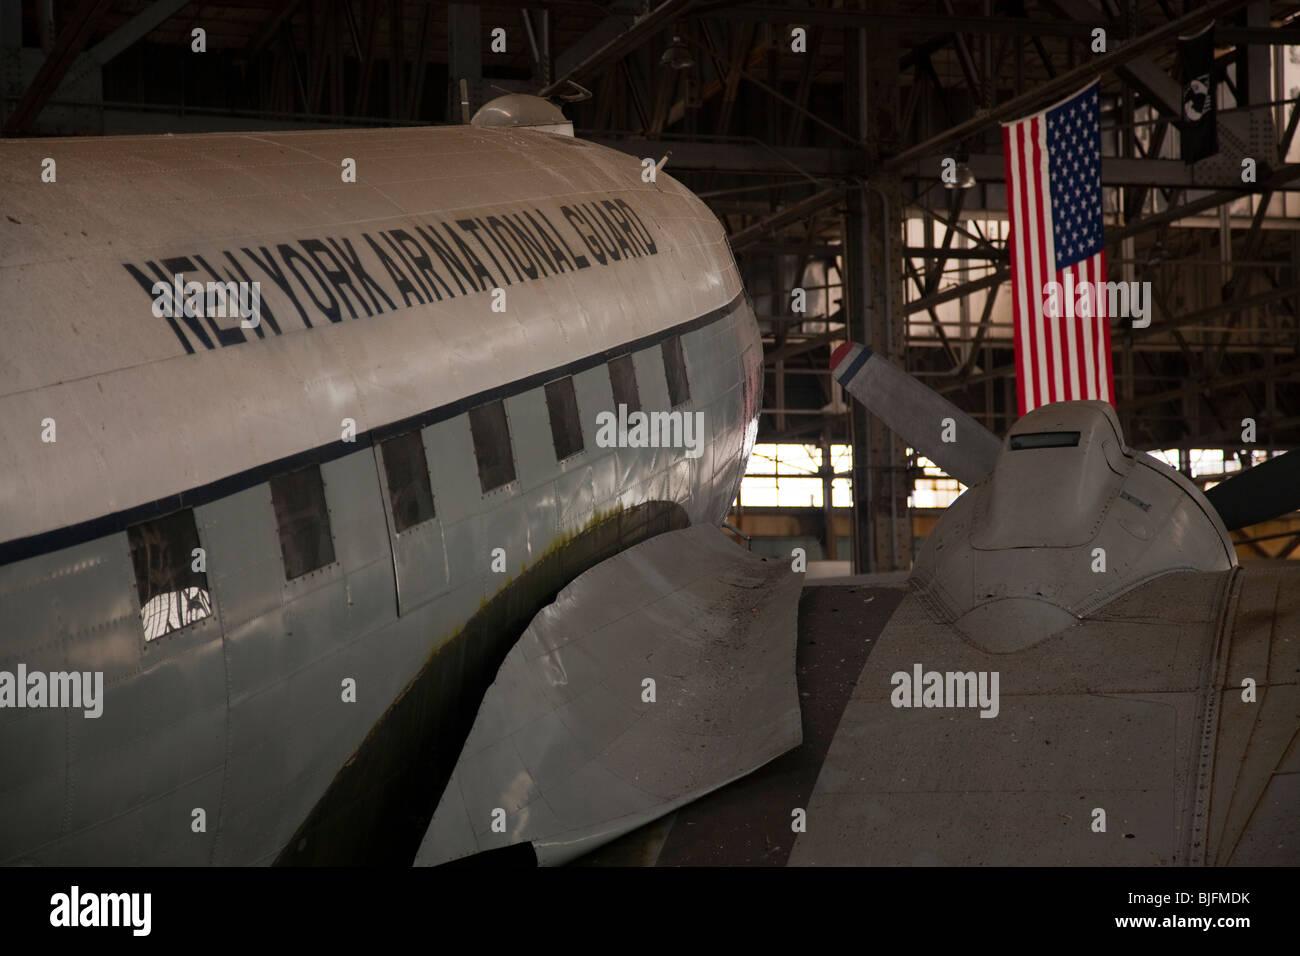 New York Air National Guard plane - Stock Image